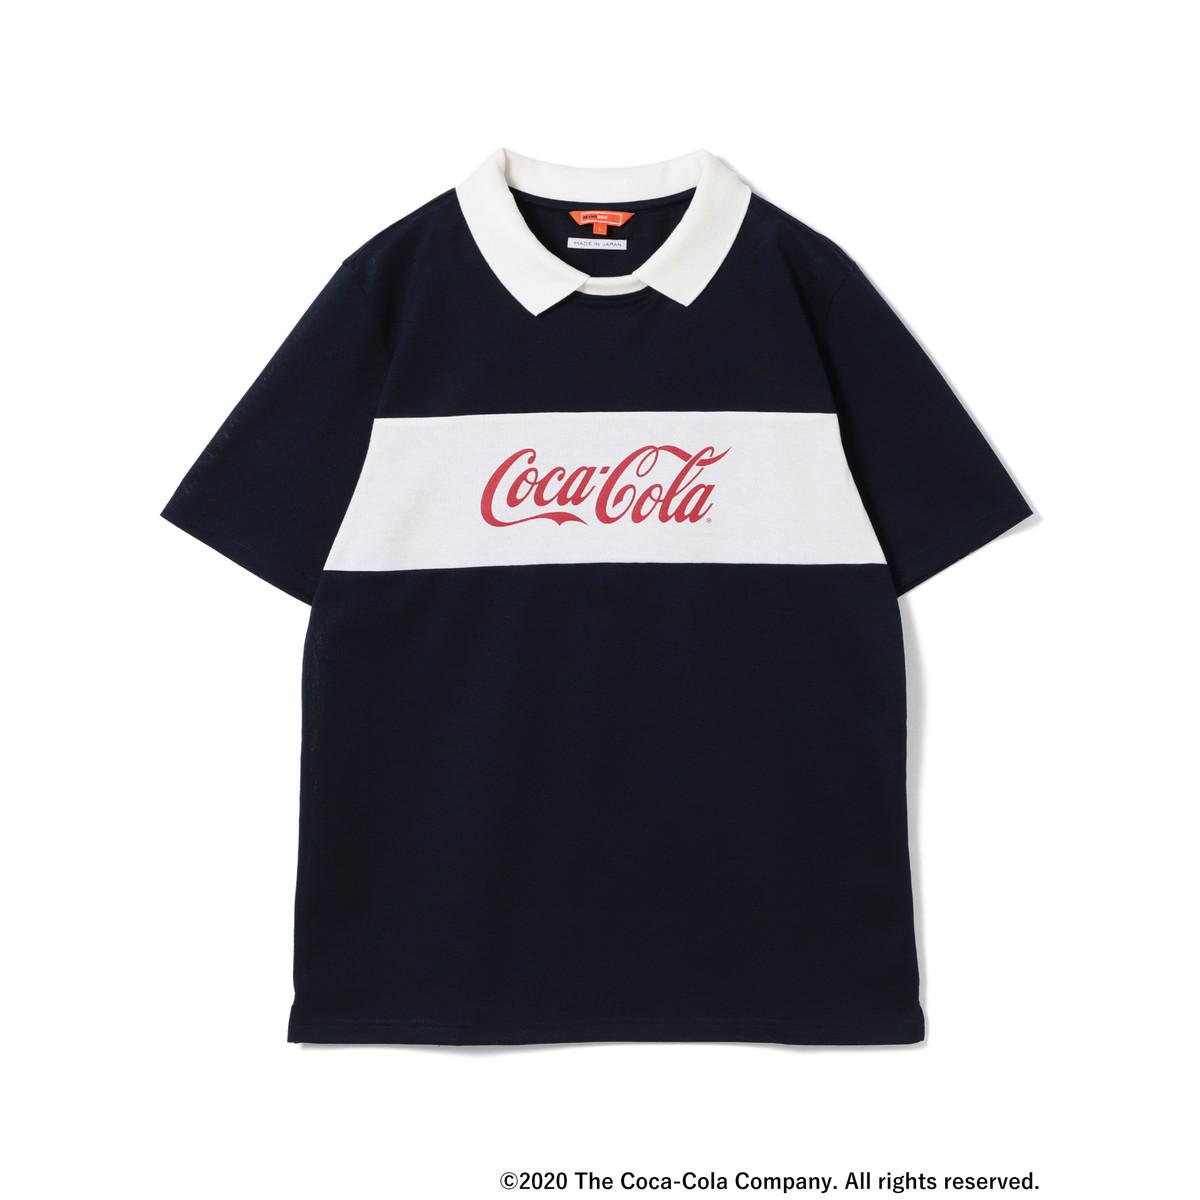 BEAMS GOLF ORANGE LABEL 別注 COCA-COLA ロゴポロシャツ